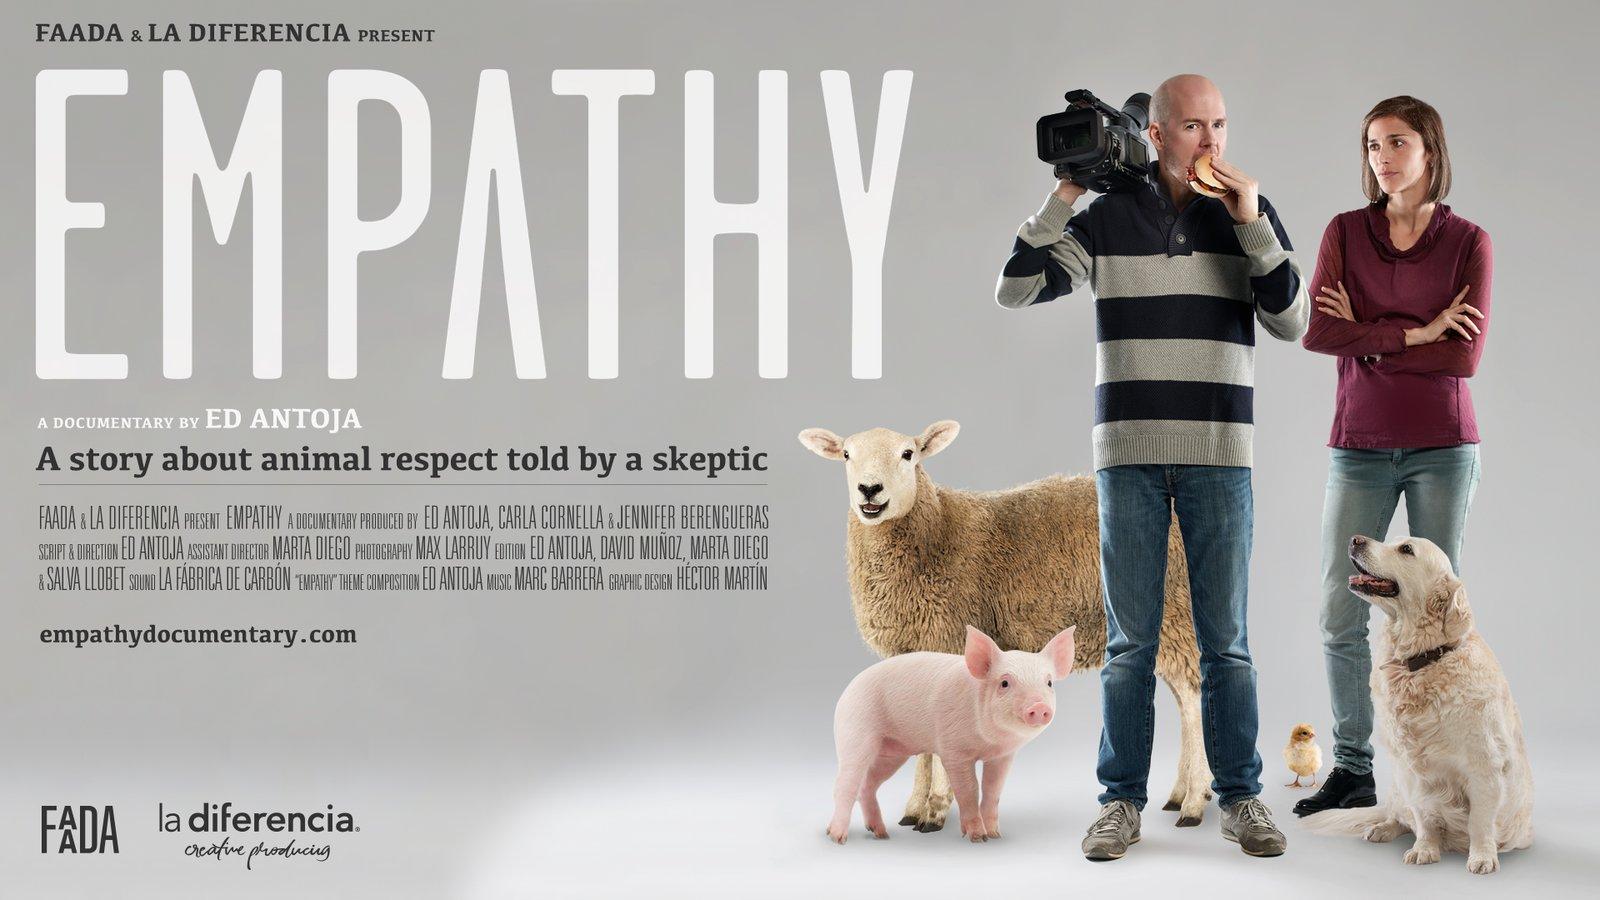 Empathy - A Skeptic Investigates Animal Cruelty